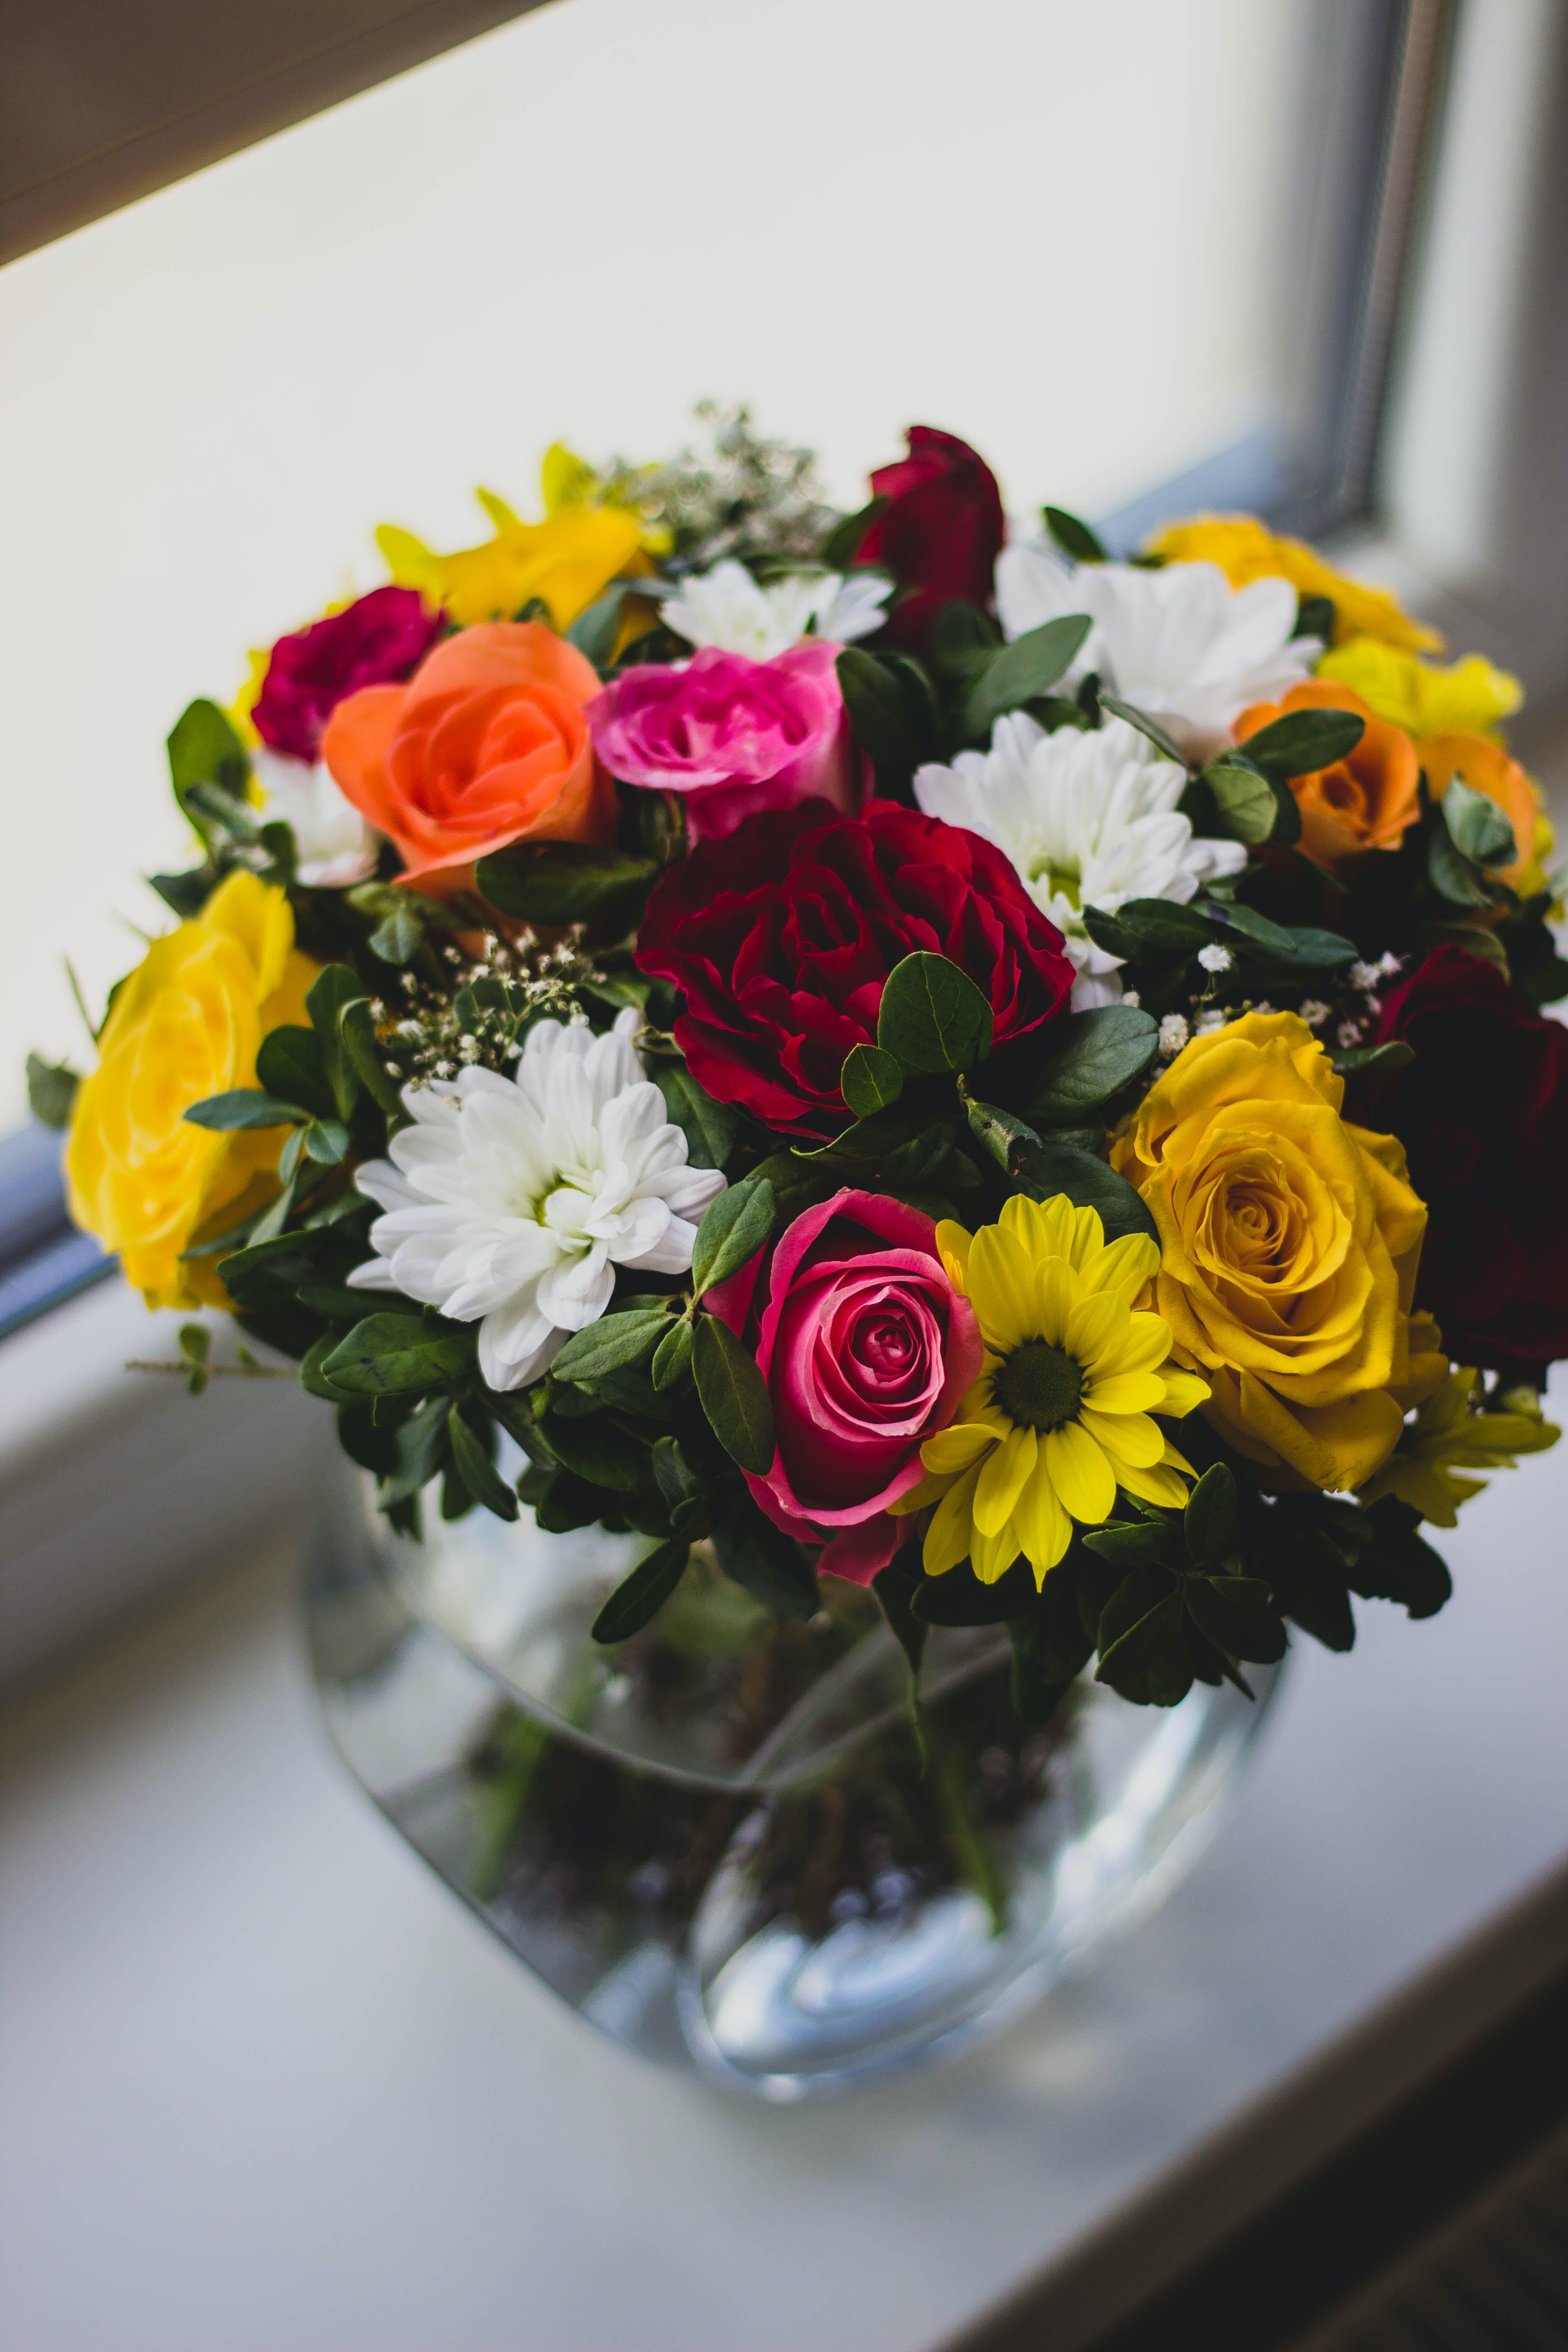 bloom, blossom, decoration